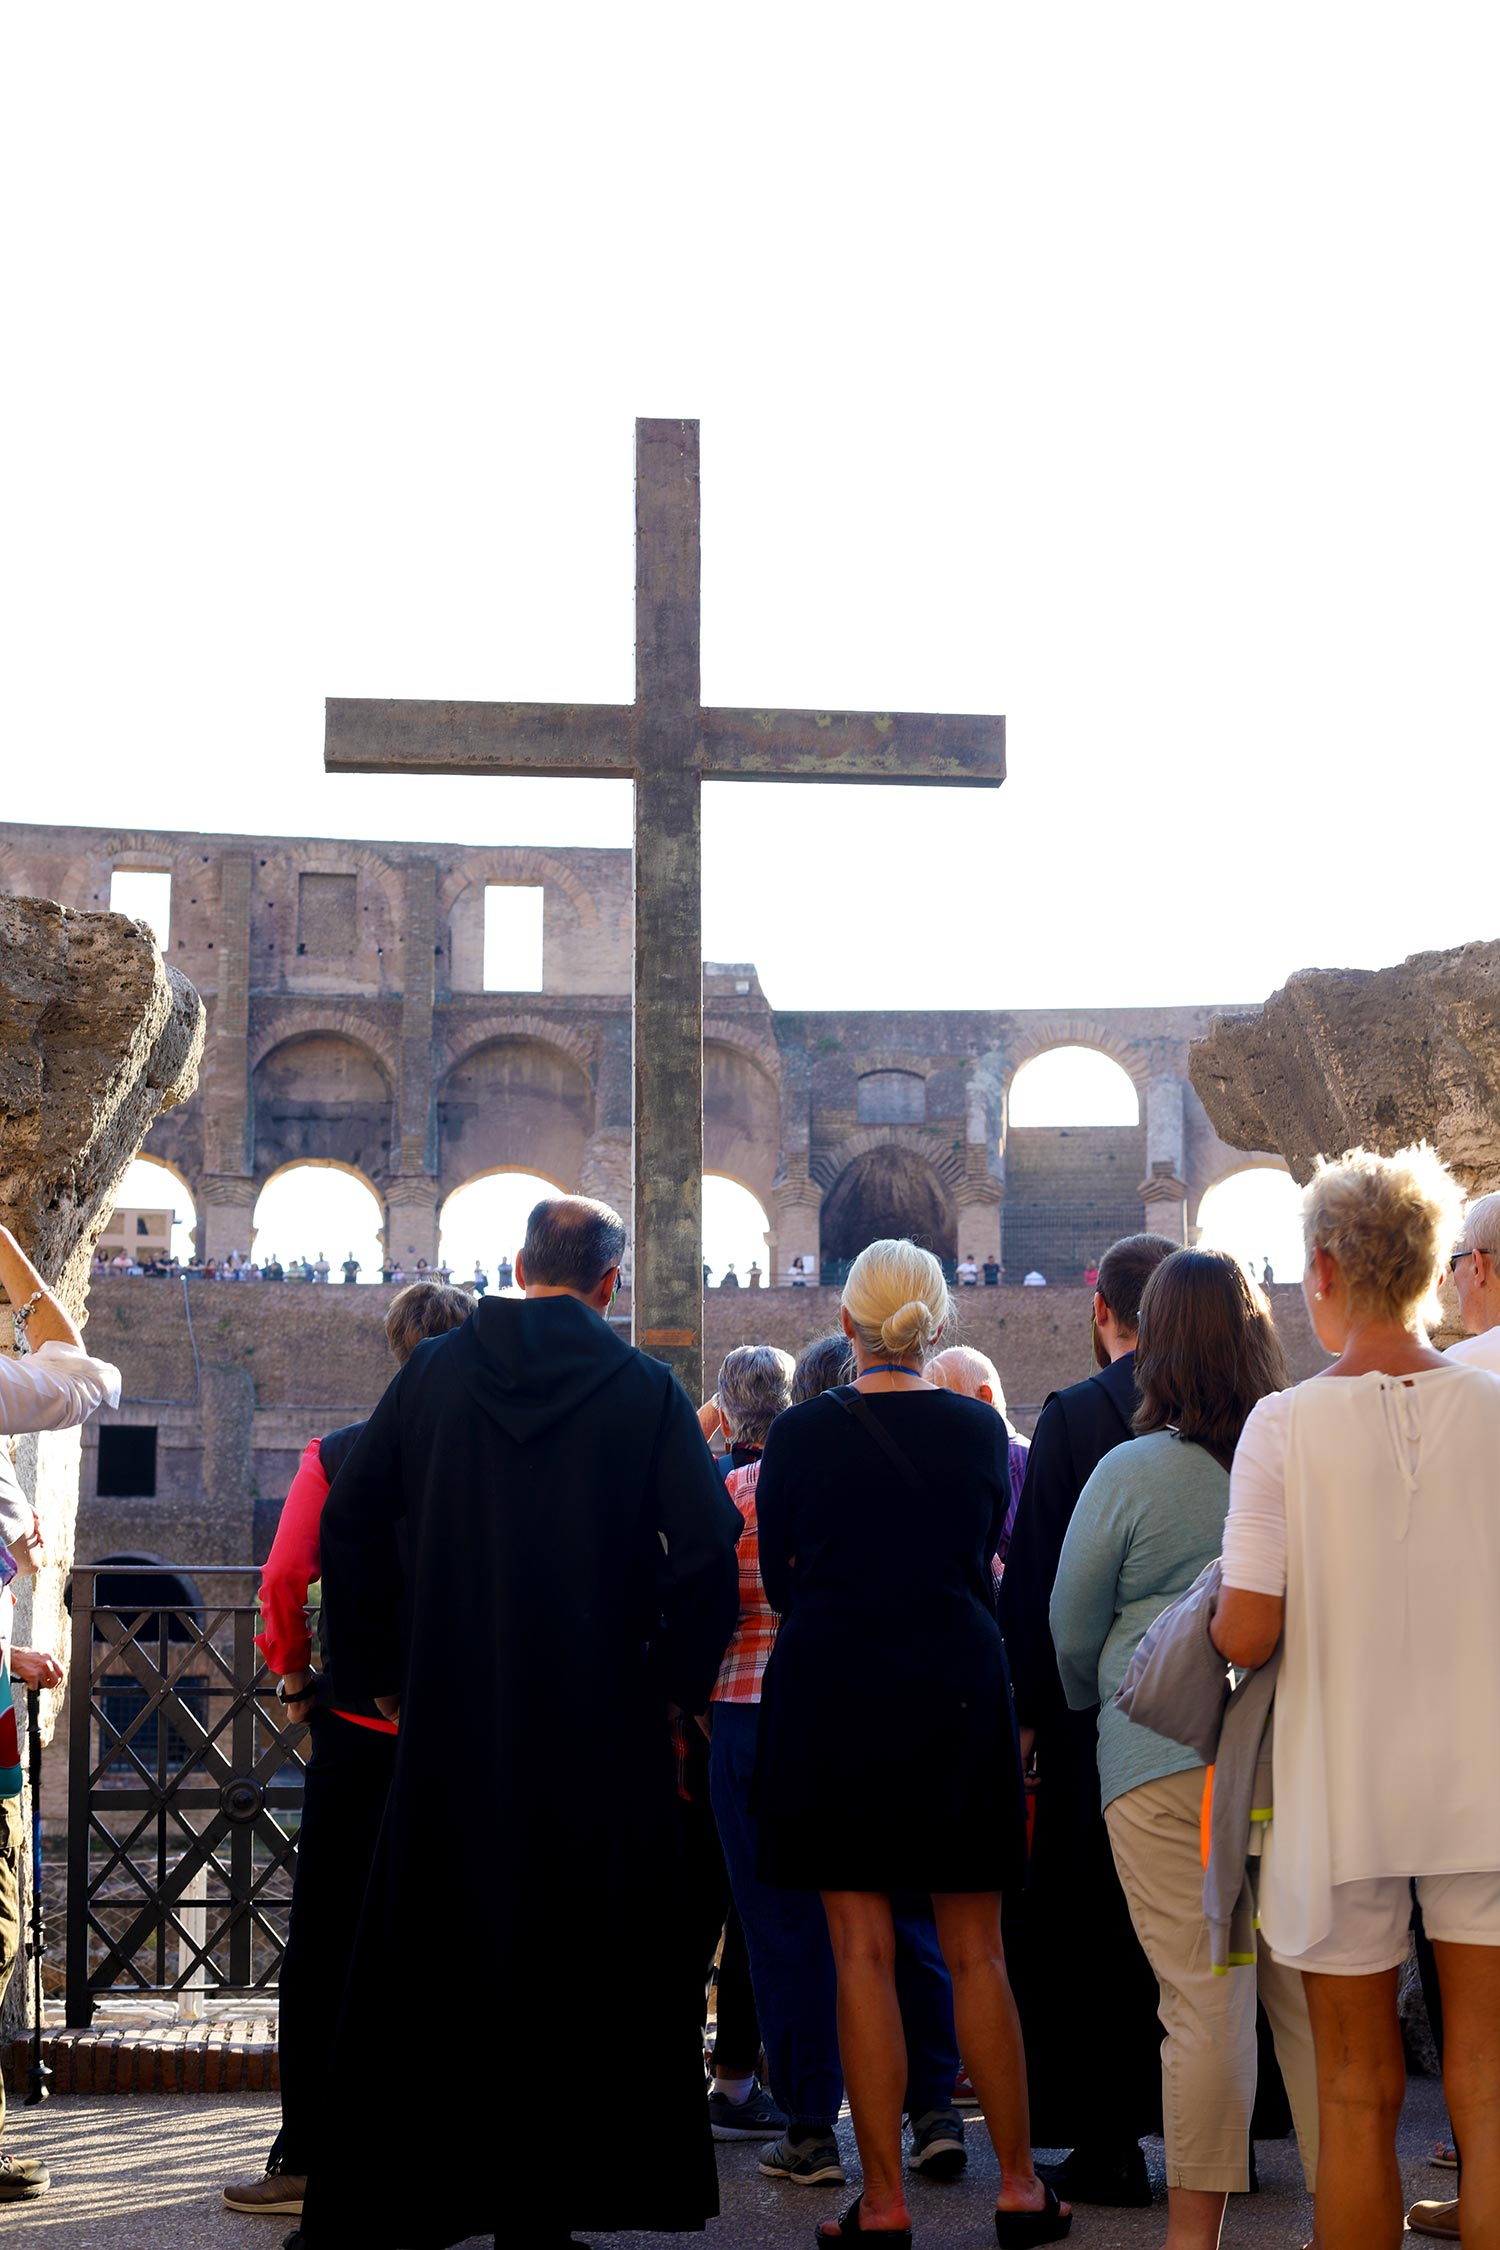 Pilgrimage_Rome_3472_Colo.jpg